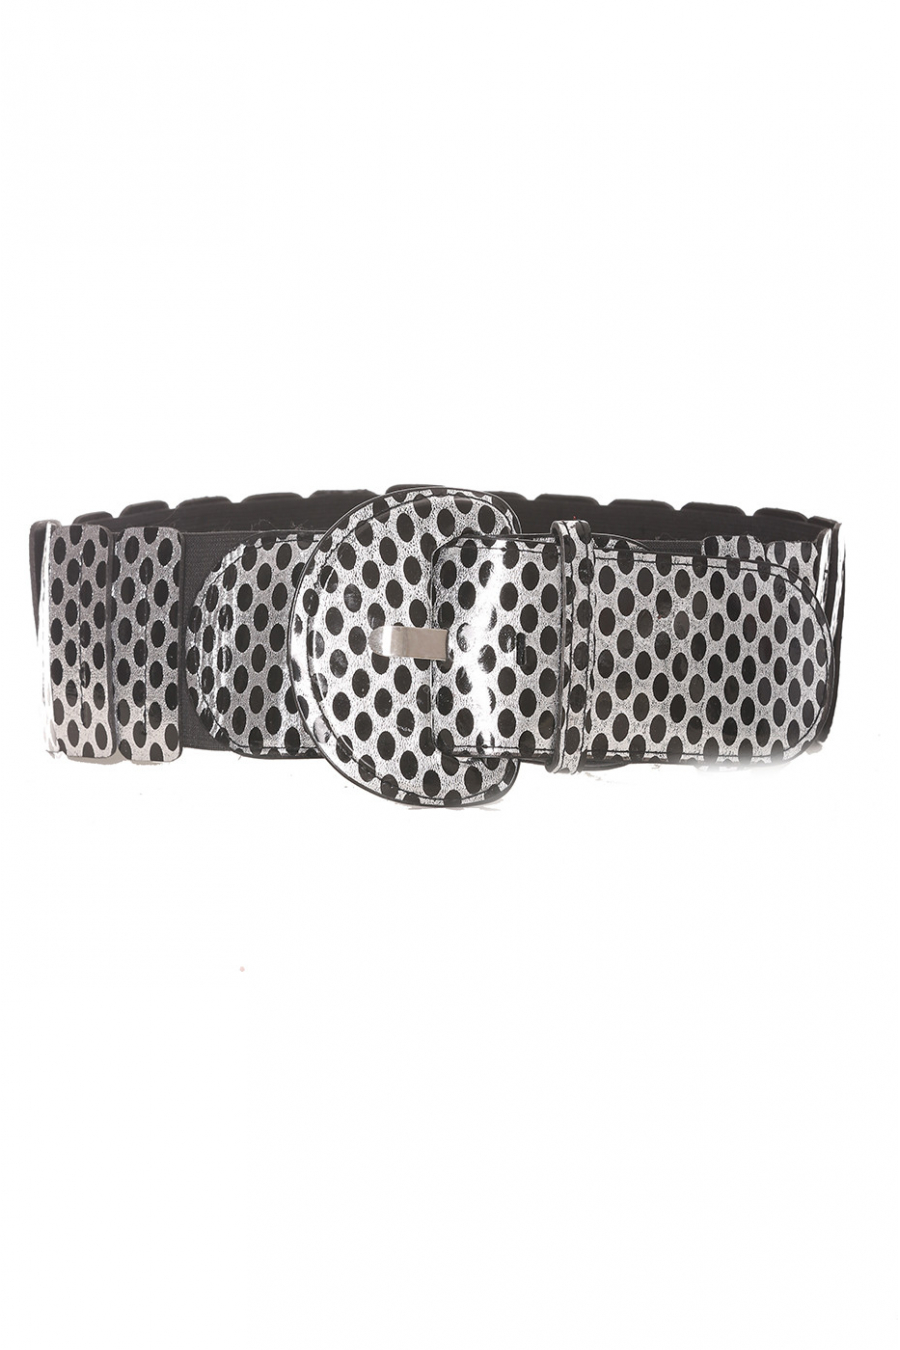 Zwarte elastische tailleband met print - BG - P045